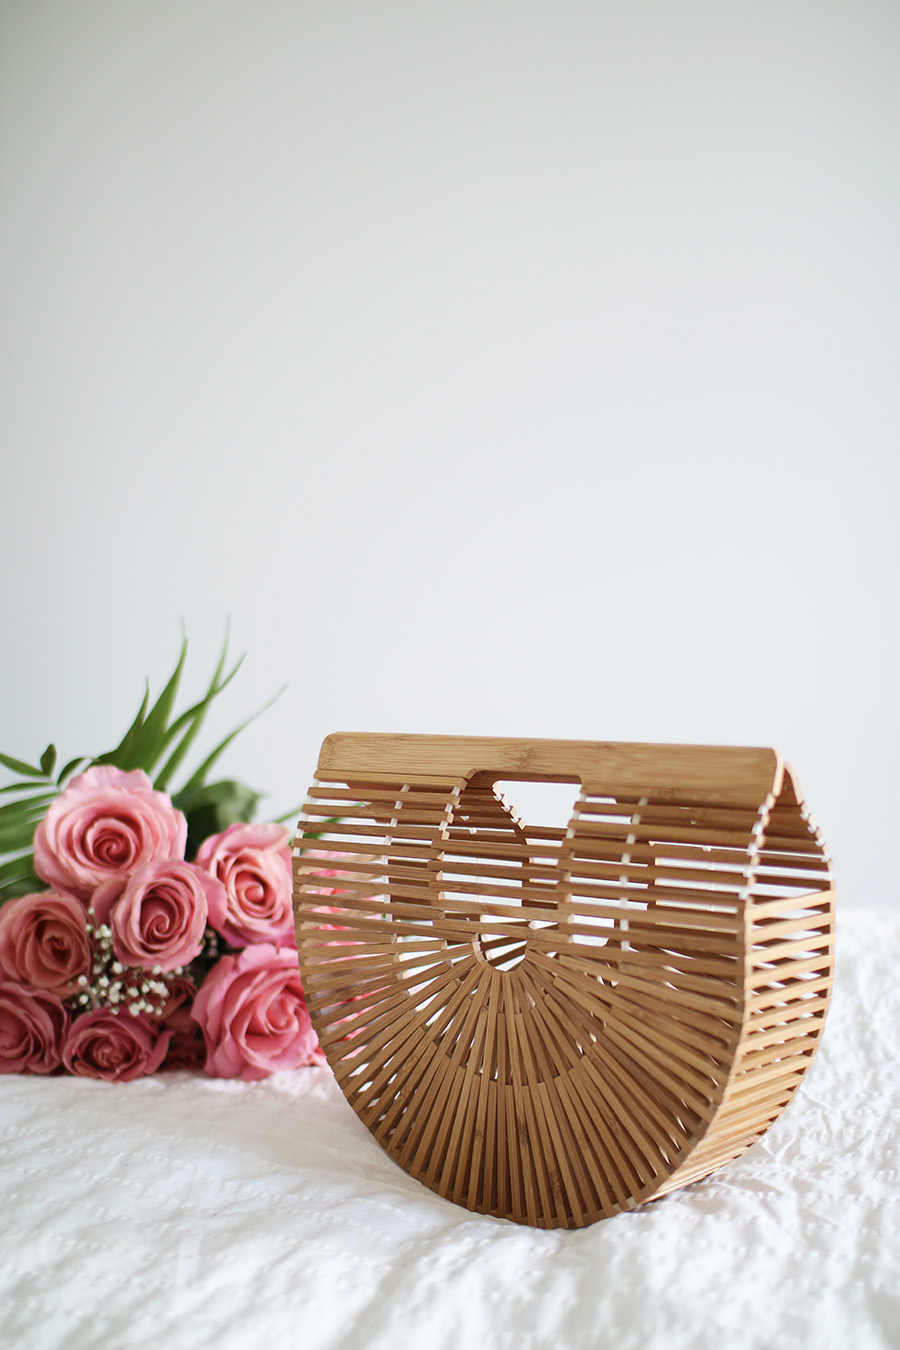 Cult Gaia Ark Clutch, Bamboo Handbag, Spring Summer Fashion via A Side Of Vogue